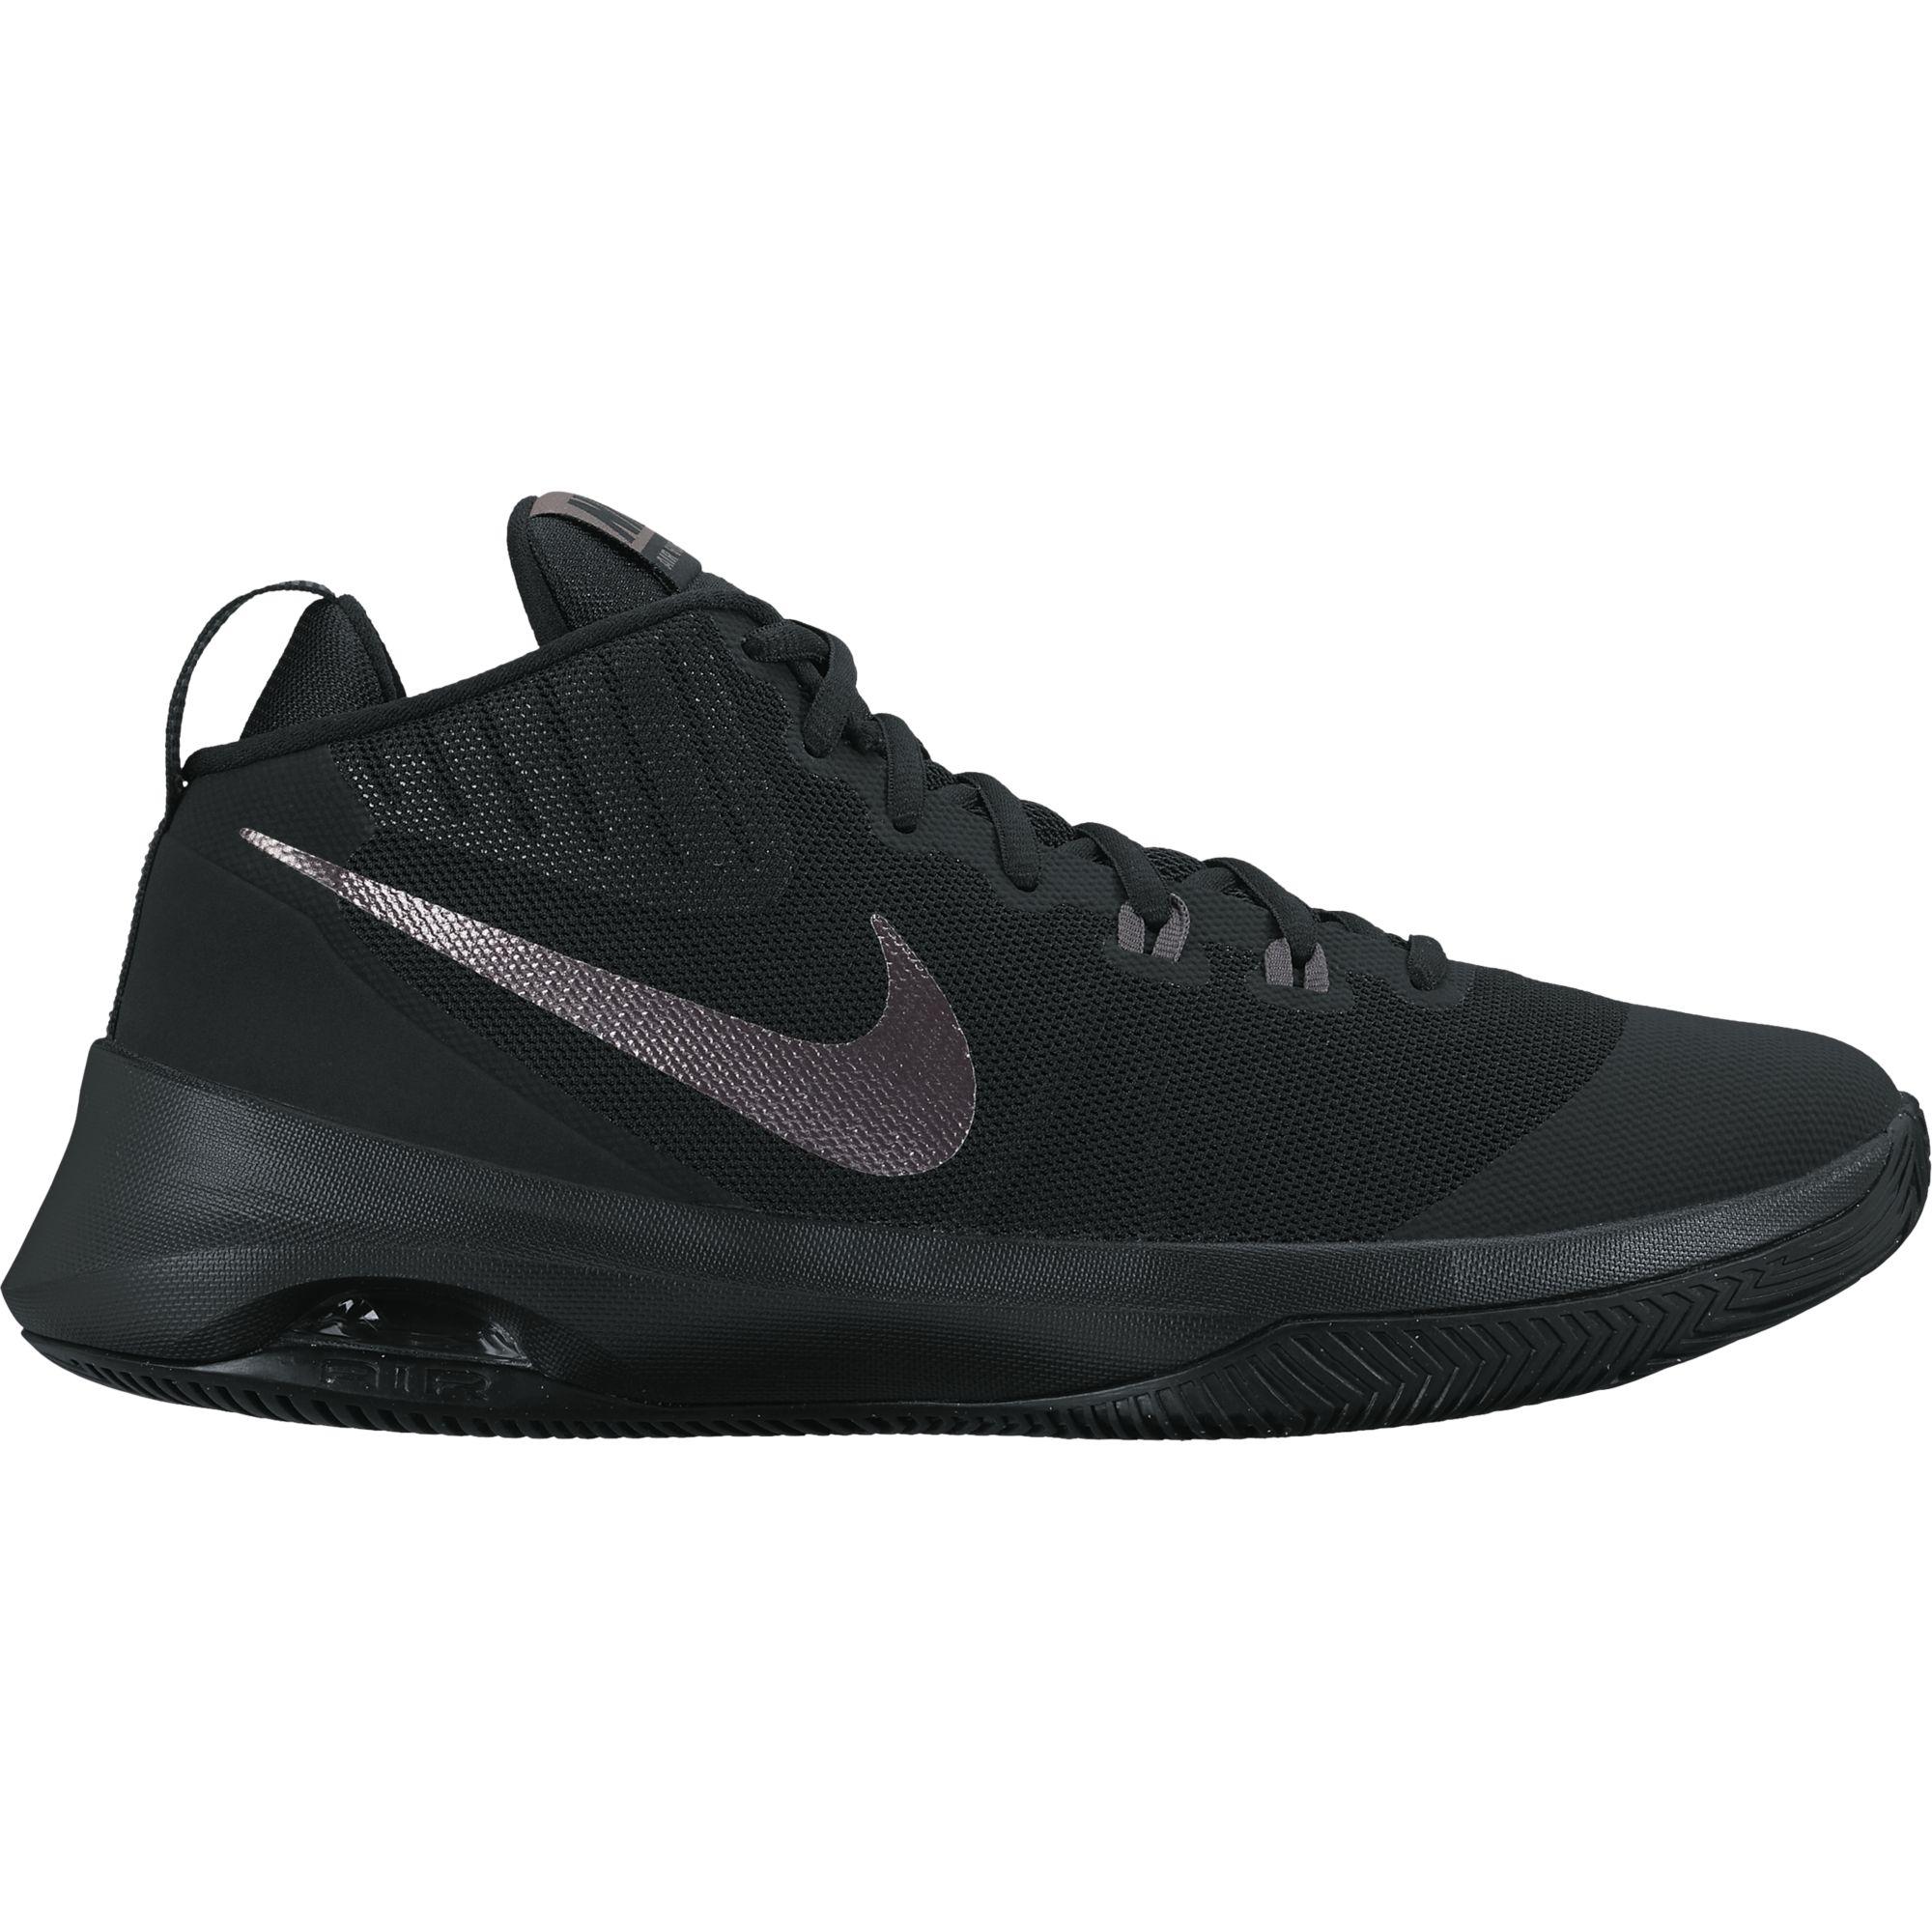 online retailer e1a6b ad387 Chaussure de Basket-ball Nike Air Versitile pour Homme   EKINSPORT